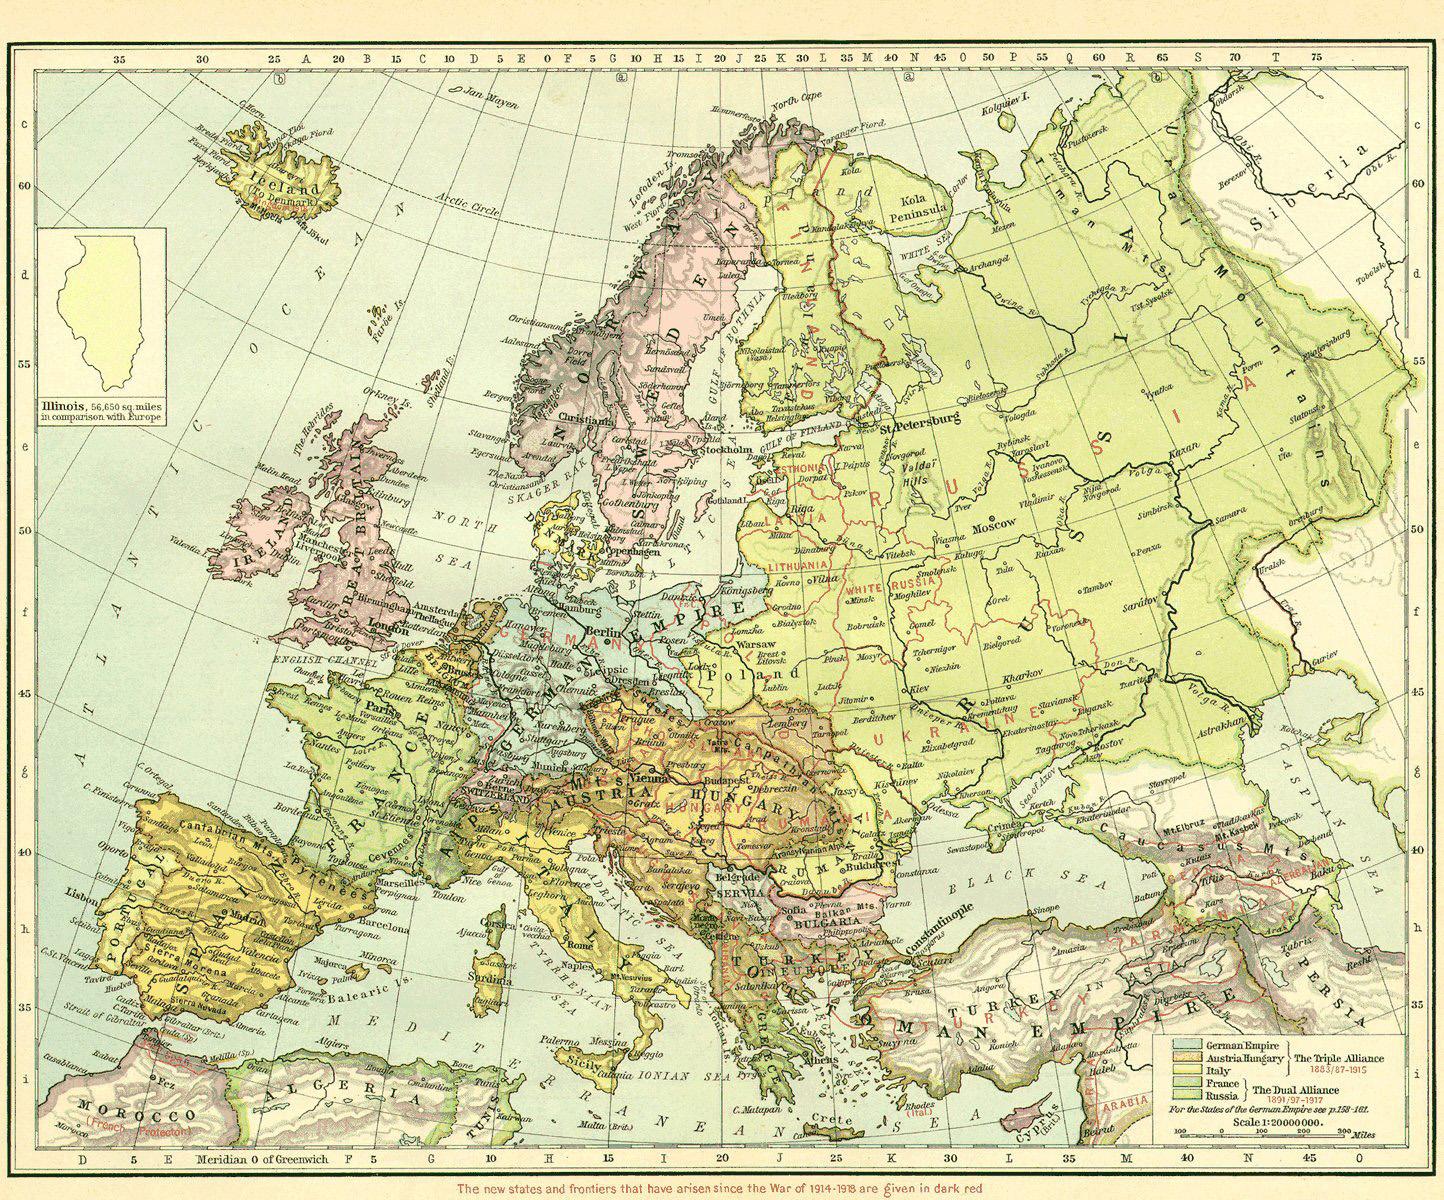 File:Europe 1918.jpg - Wikimedia Commons